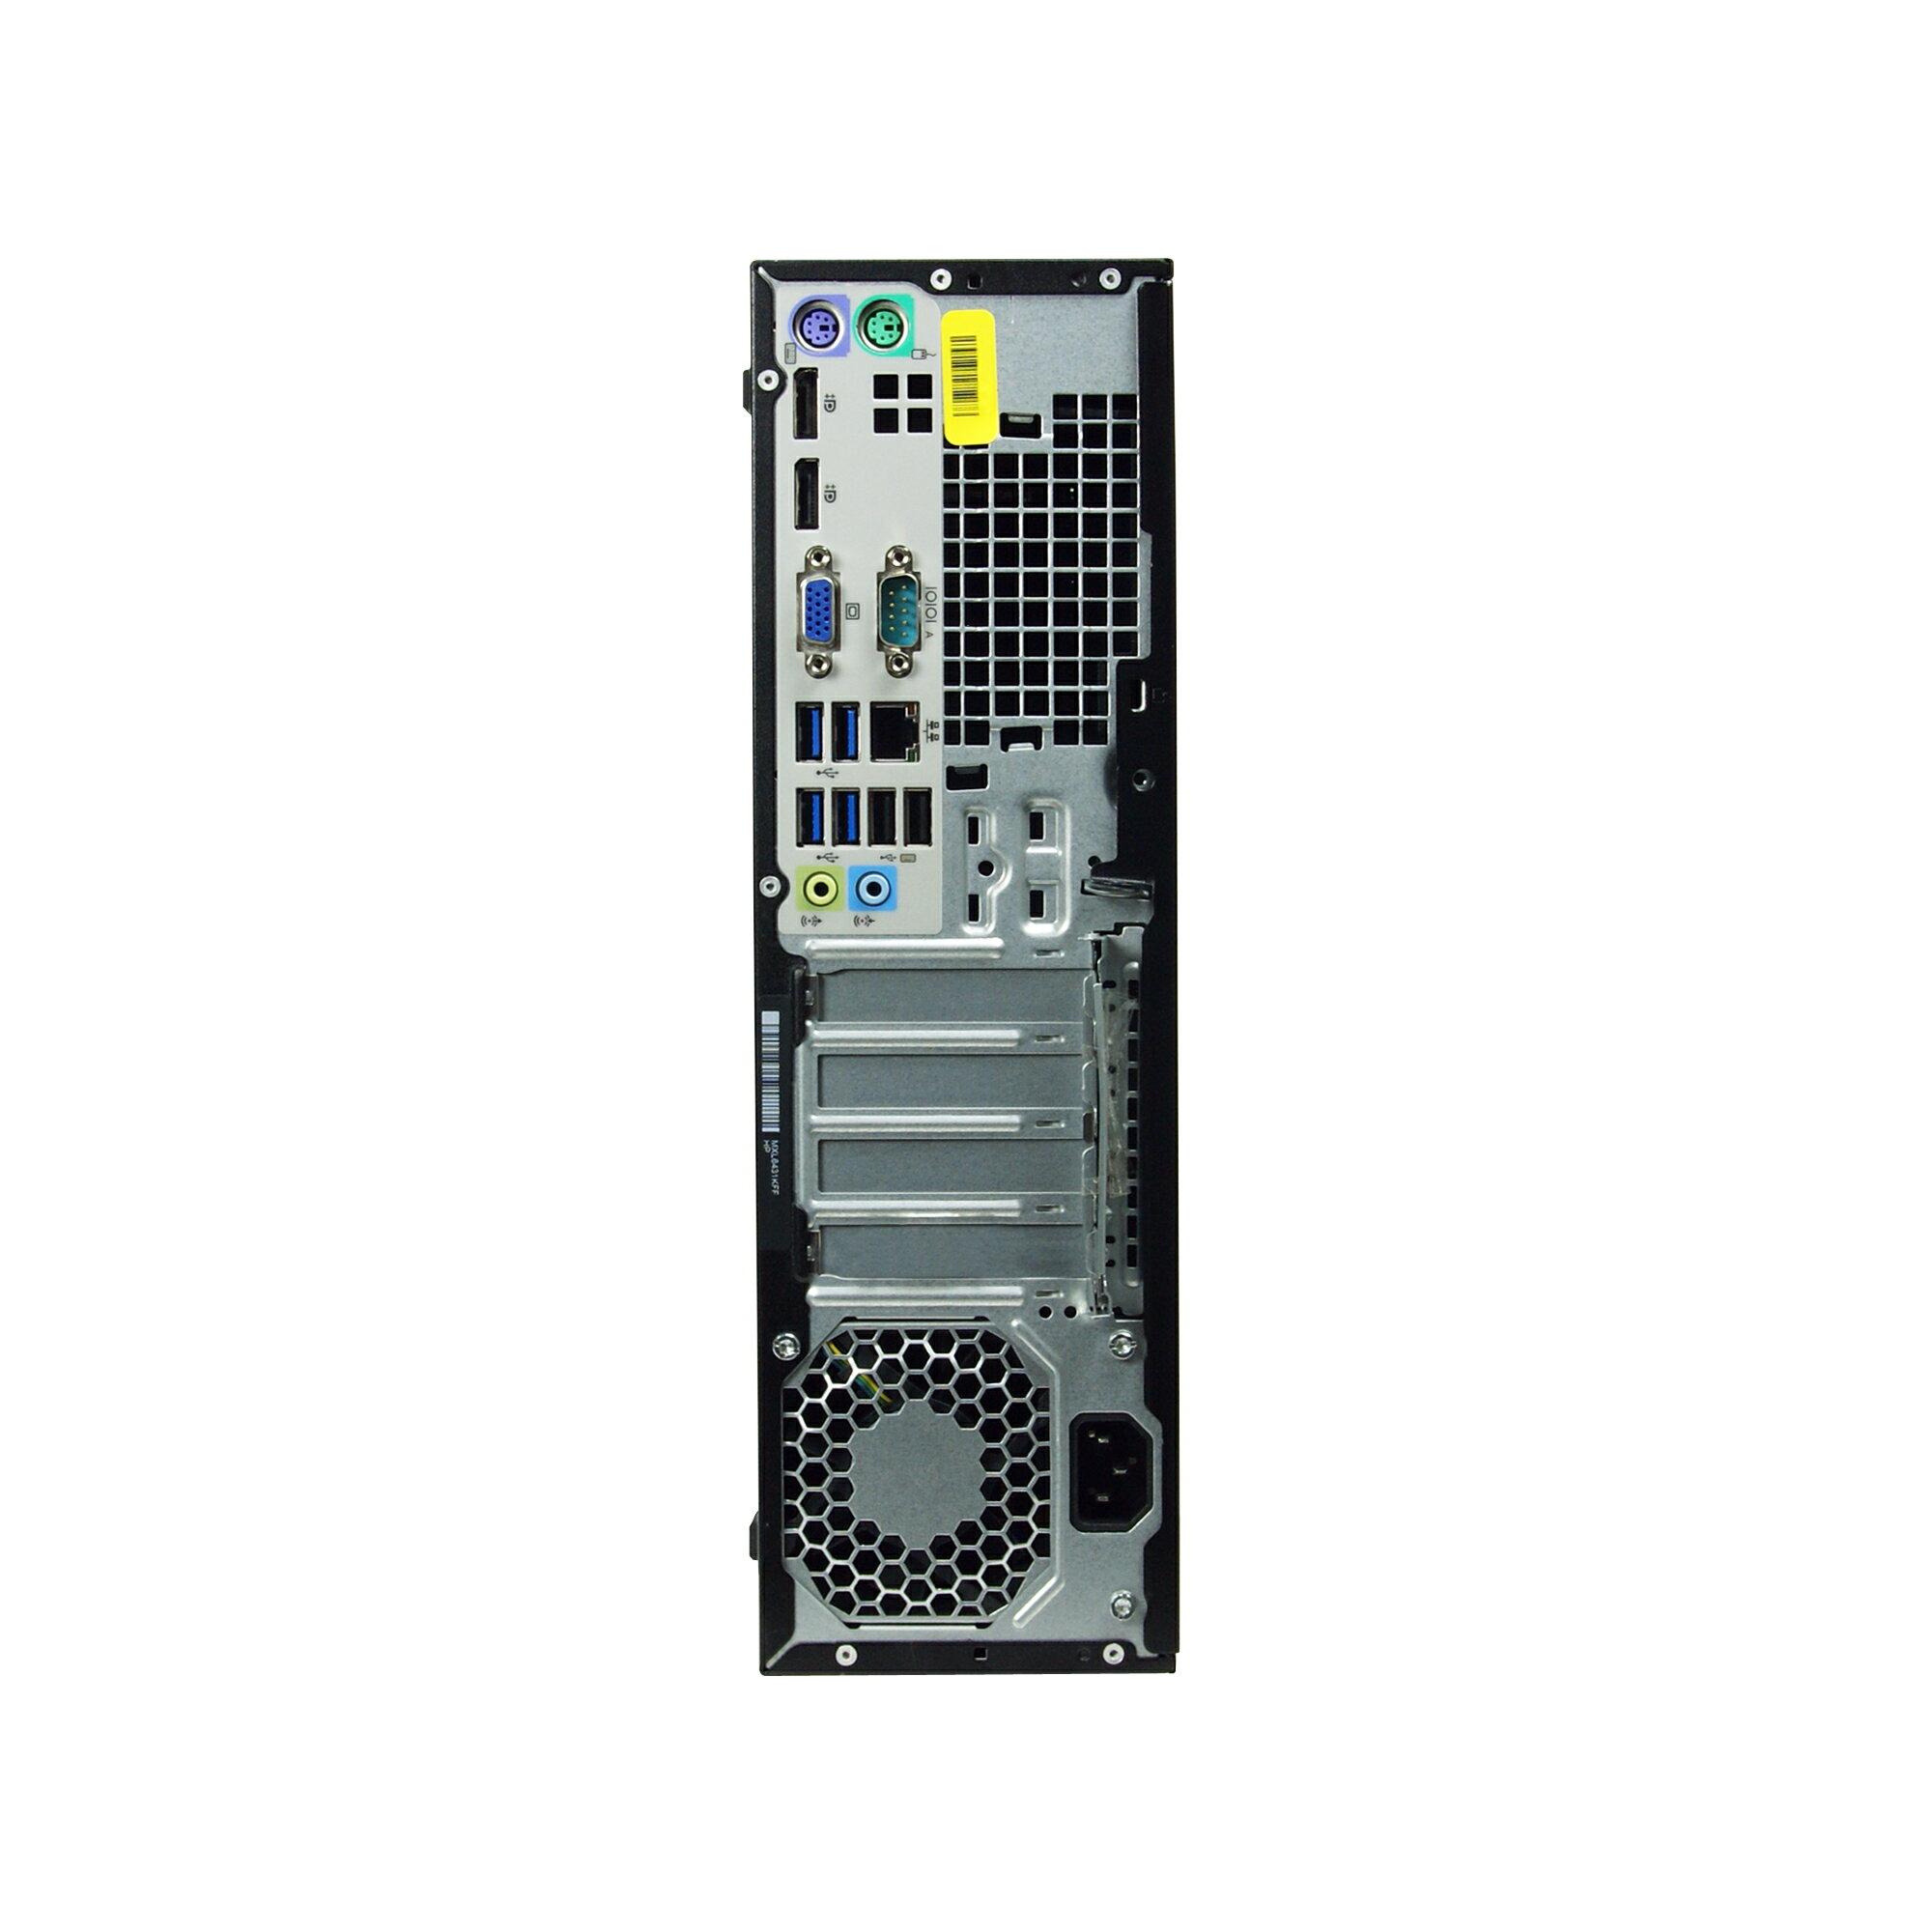 hp prodesk 600 g2 sff manual